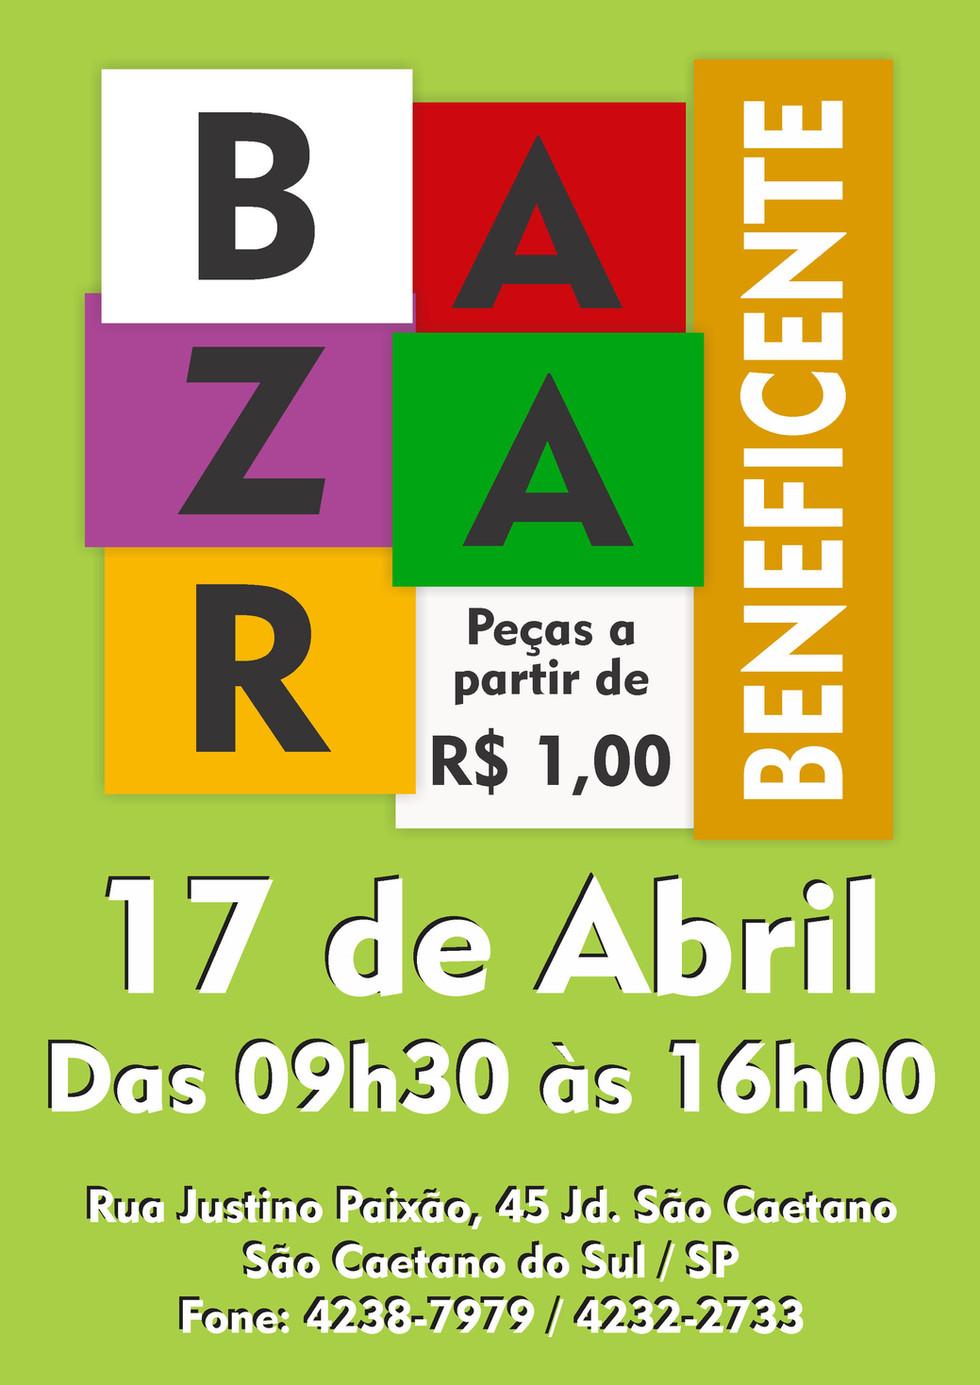 Bazar Beneficente de Abril